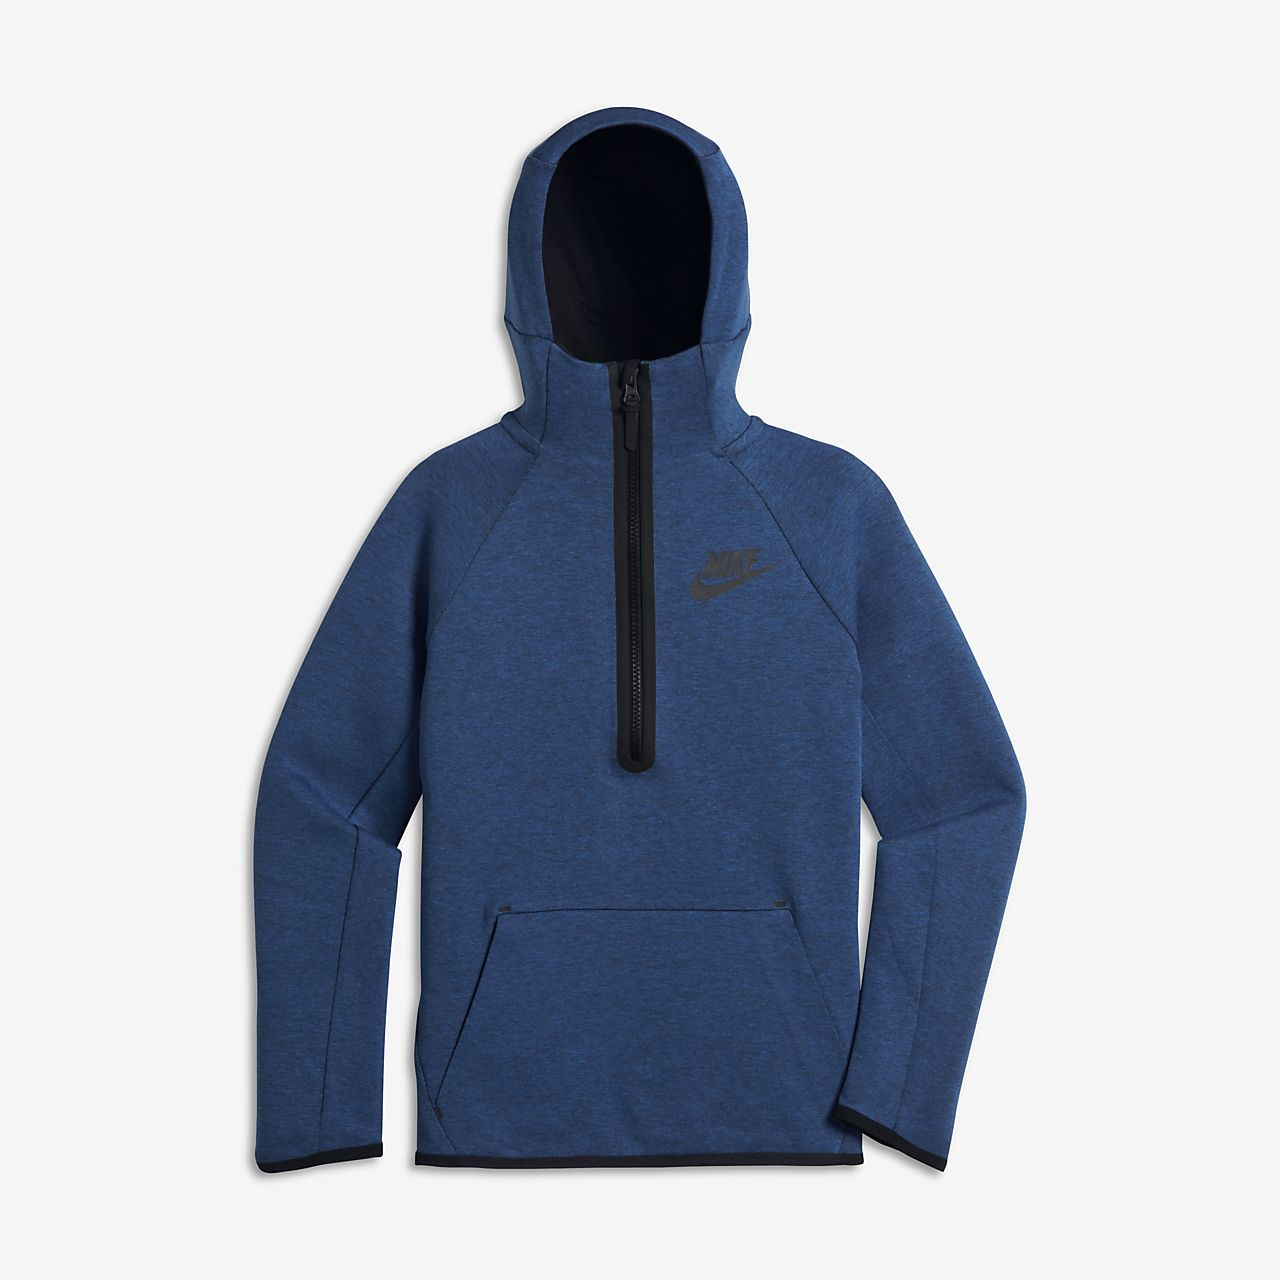 Sweat à capuche Nike Sportswear Tech Fleece pour Garçon plus âgé